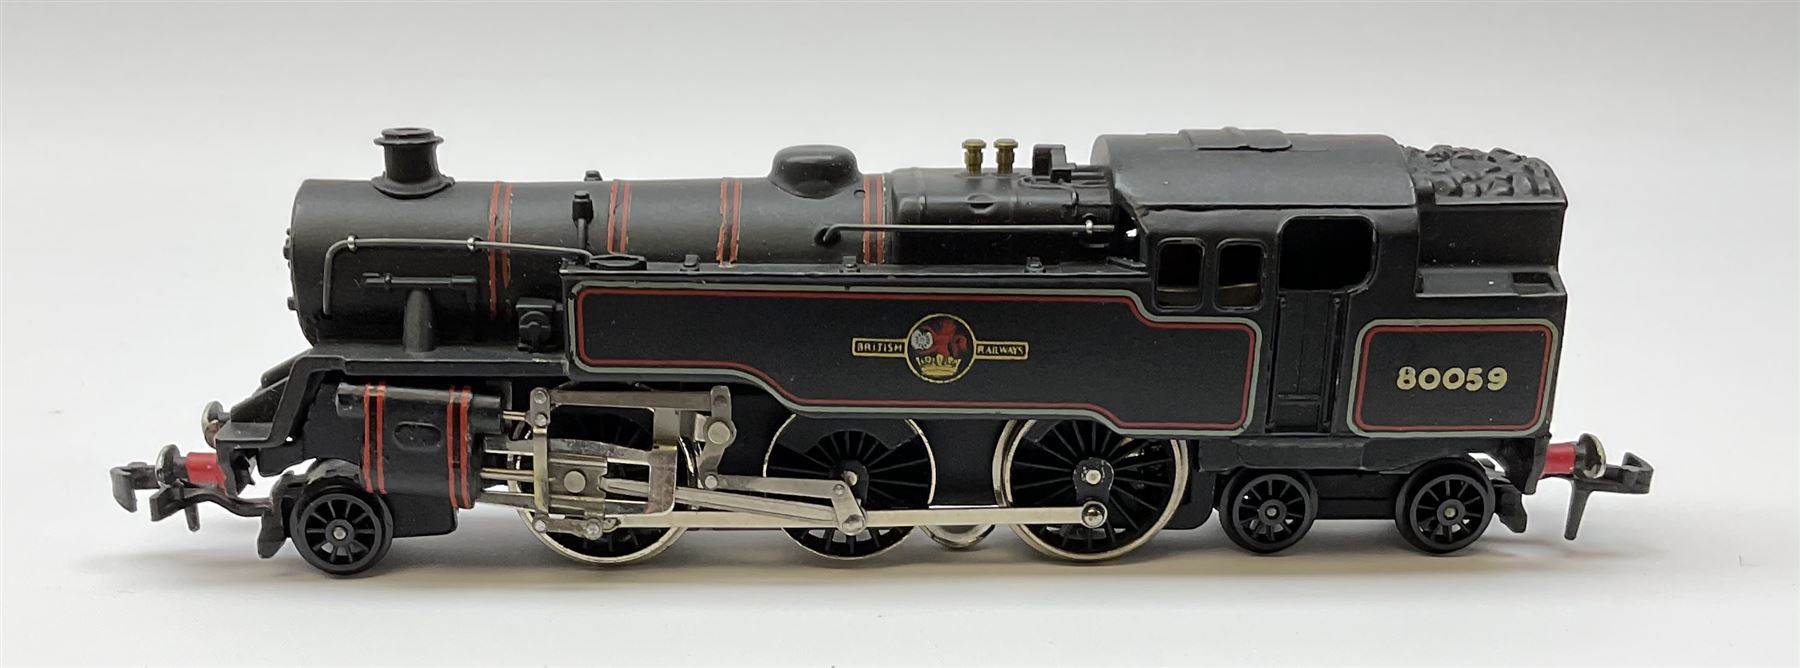 Hornby Dublo - three-rail 4MT Standard 2-6-4 Tank locomotive No.80059 with totems facing forward - Image 3 of 6